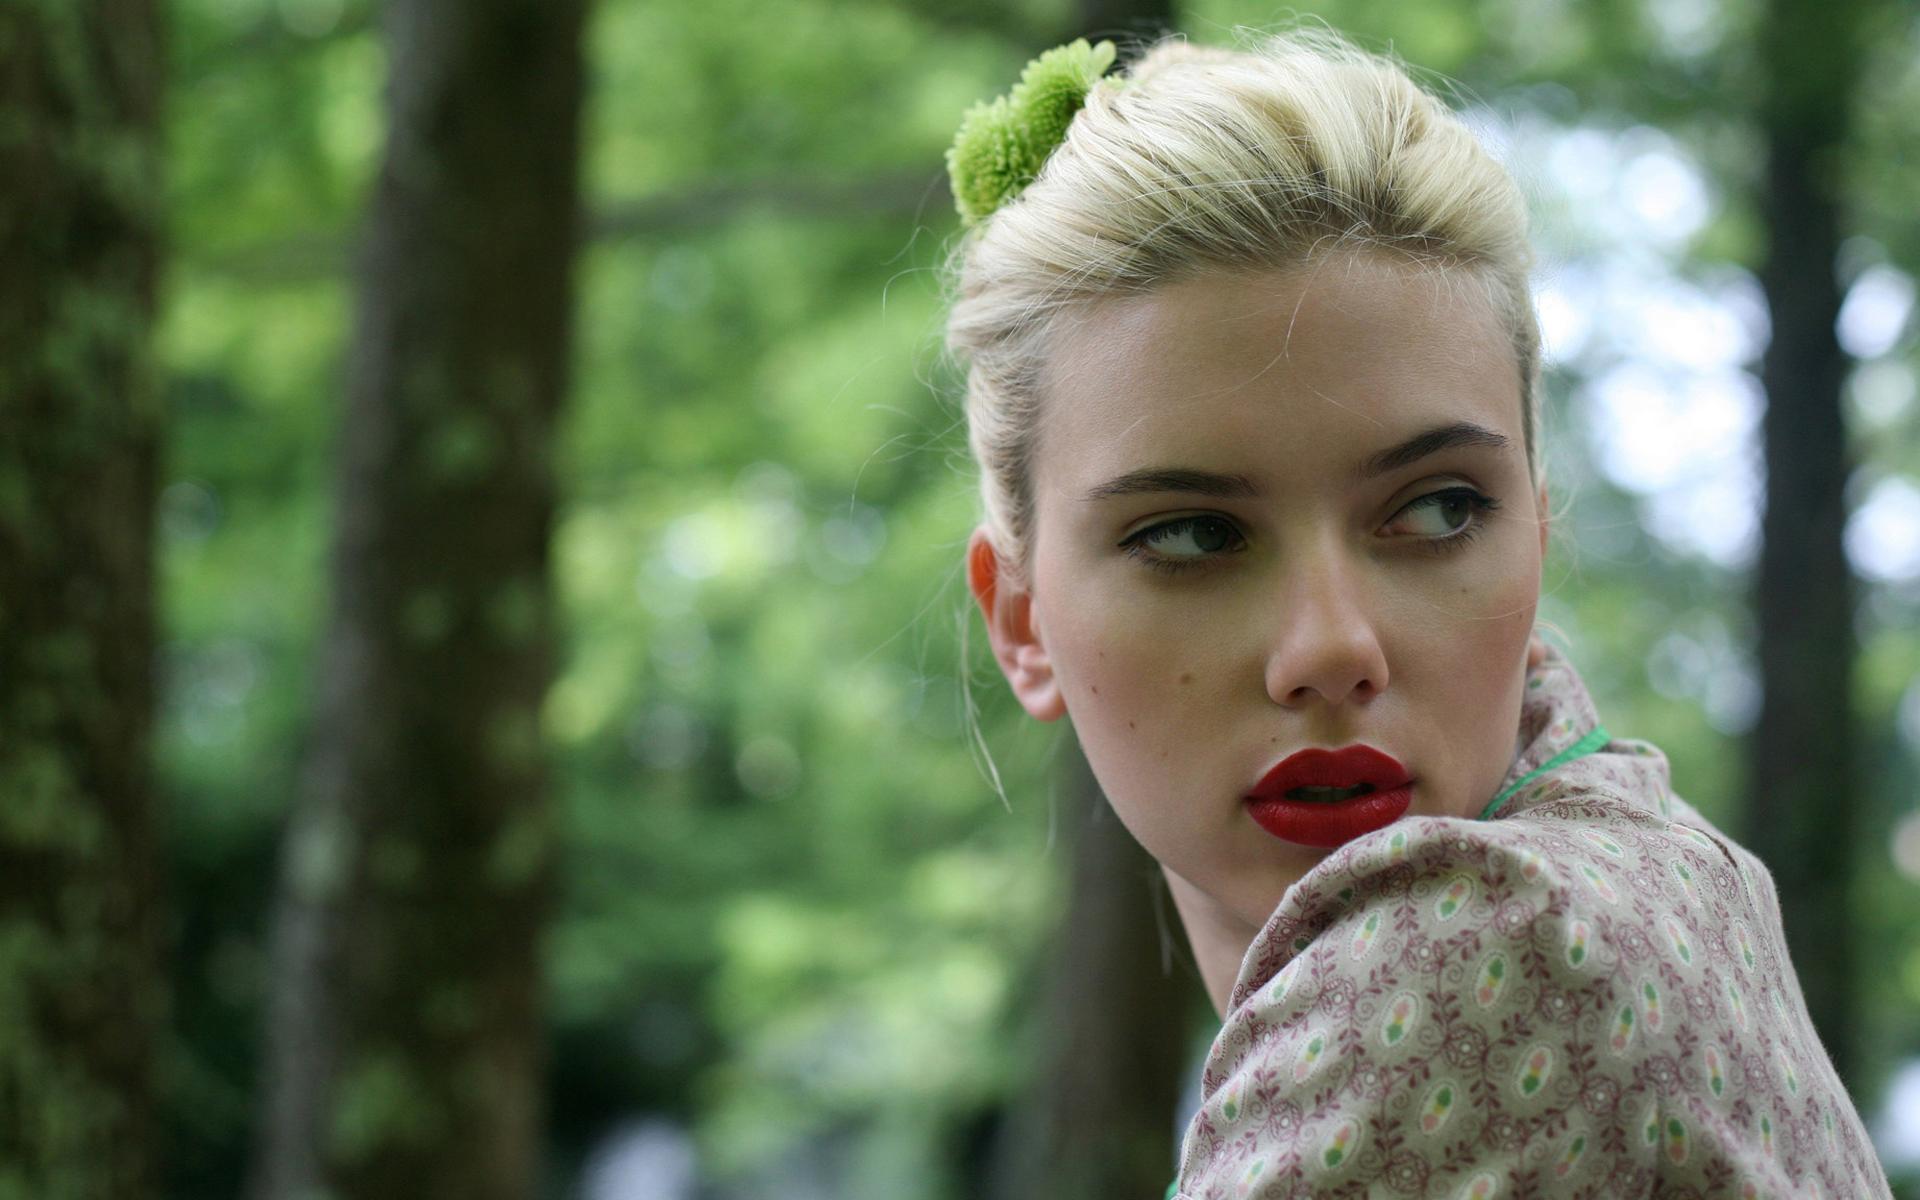 High Quality Hds Pics Of Scarlett Johansson As Redhead: Scarlett Johansson • Image Album